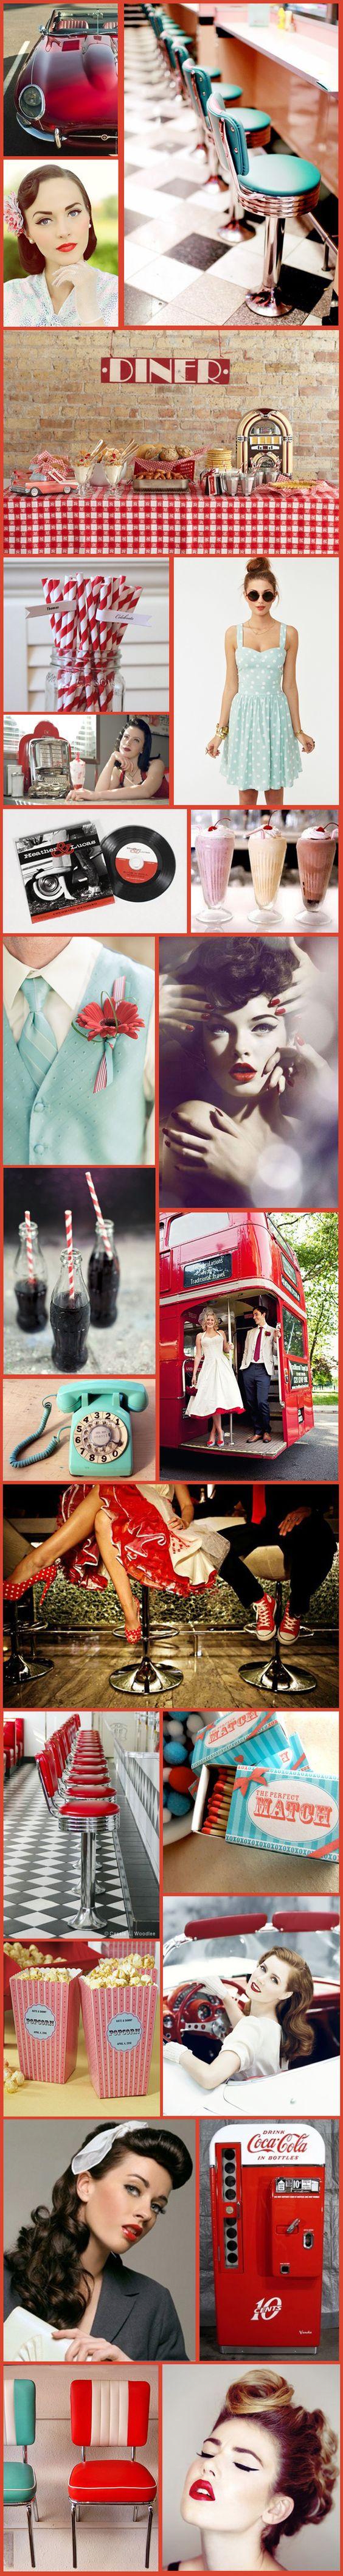 Wednesday Wedding Inspiration: Fun 50′s Retro Theme! – Bespoke-Bride: Wedding Blog ohmygod yes, this has completely changed my theme for my wedding!